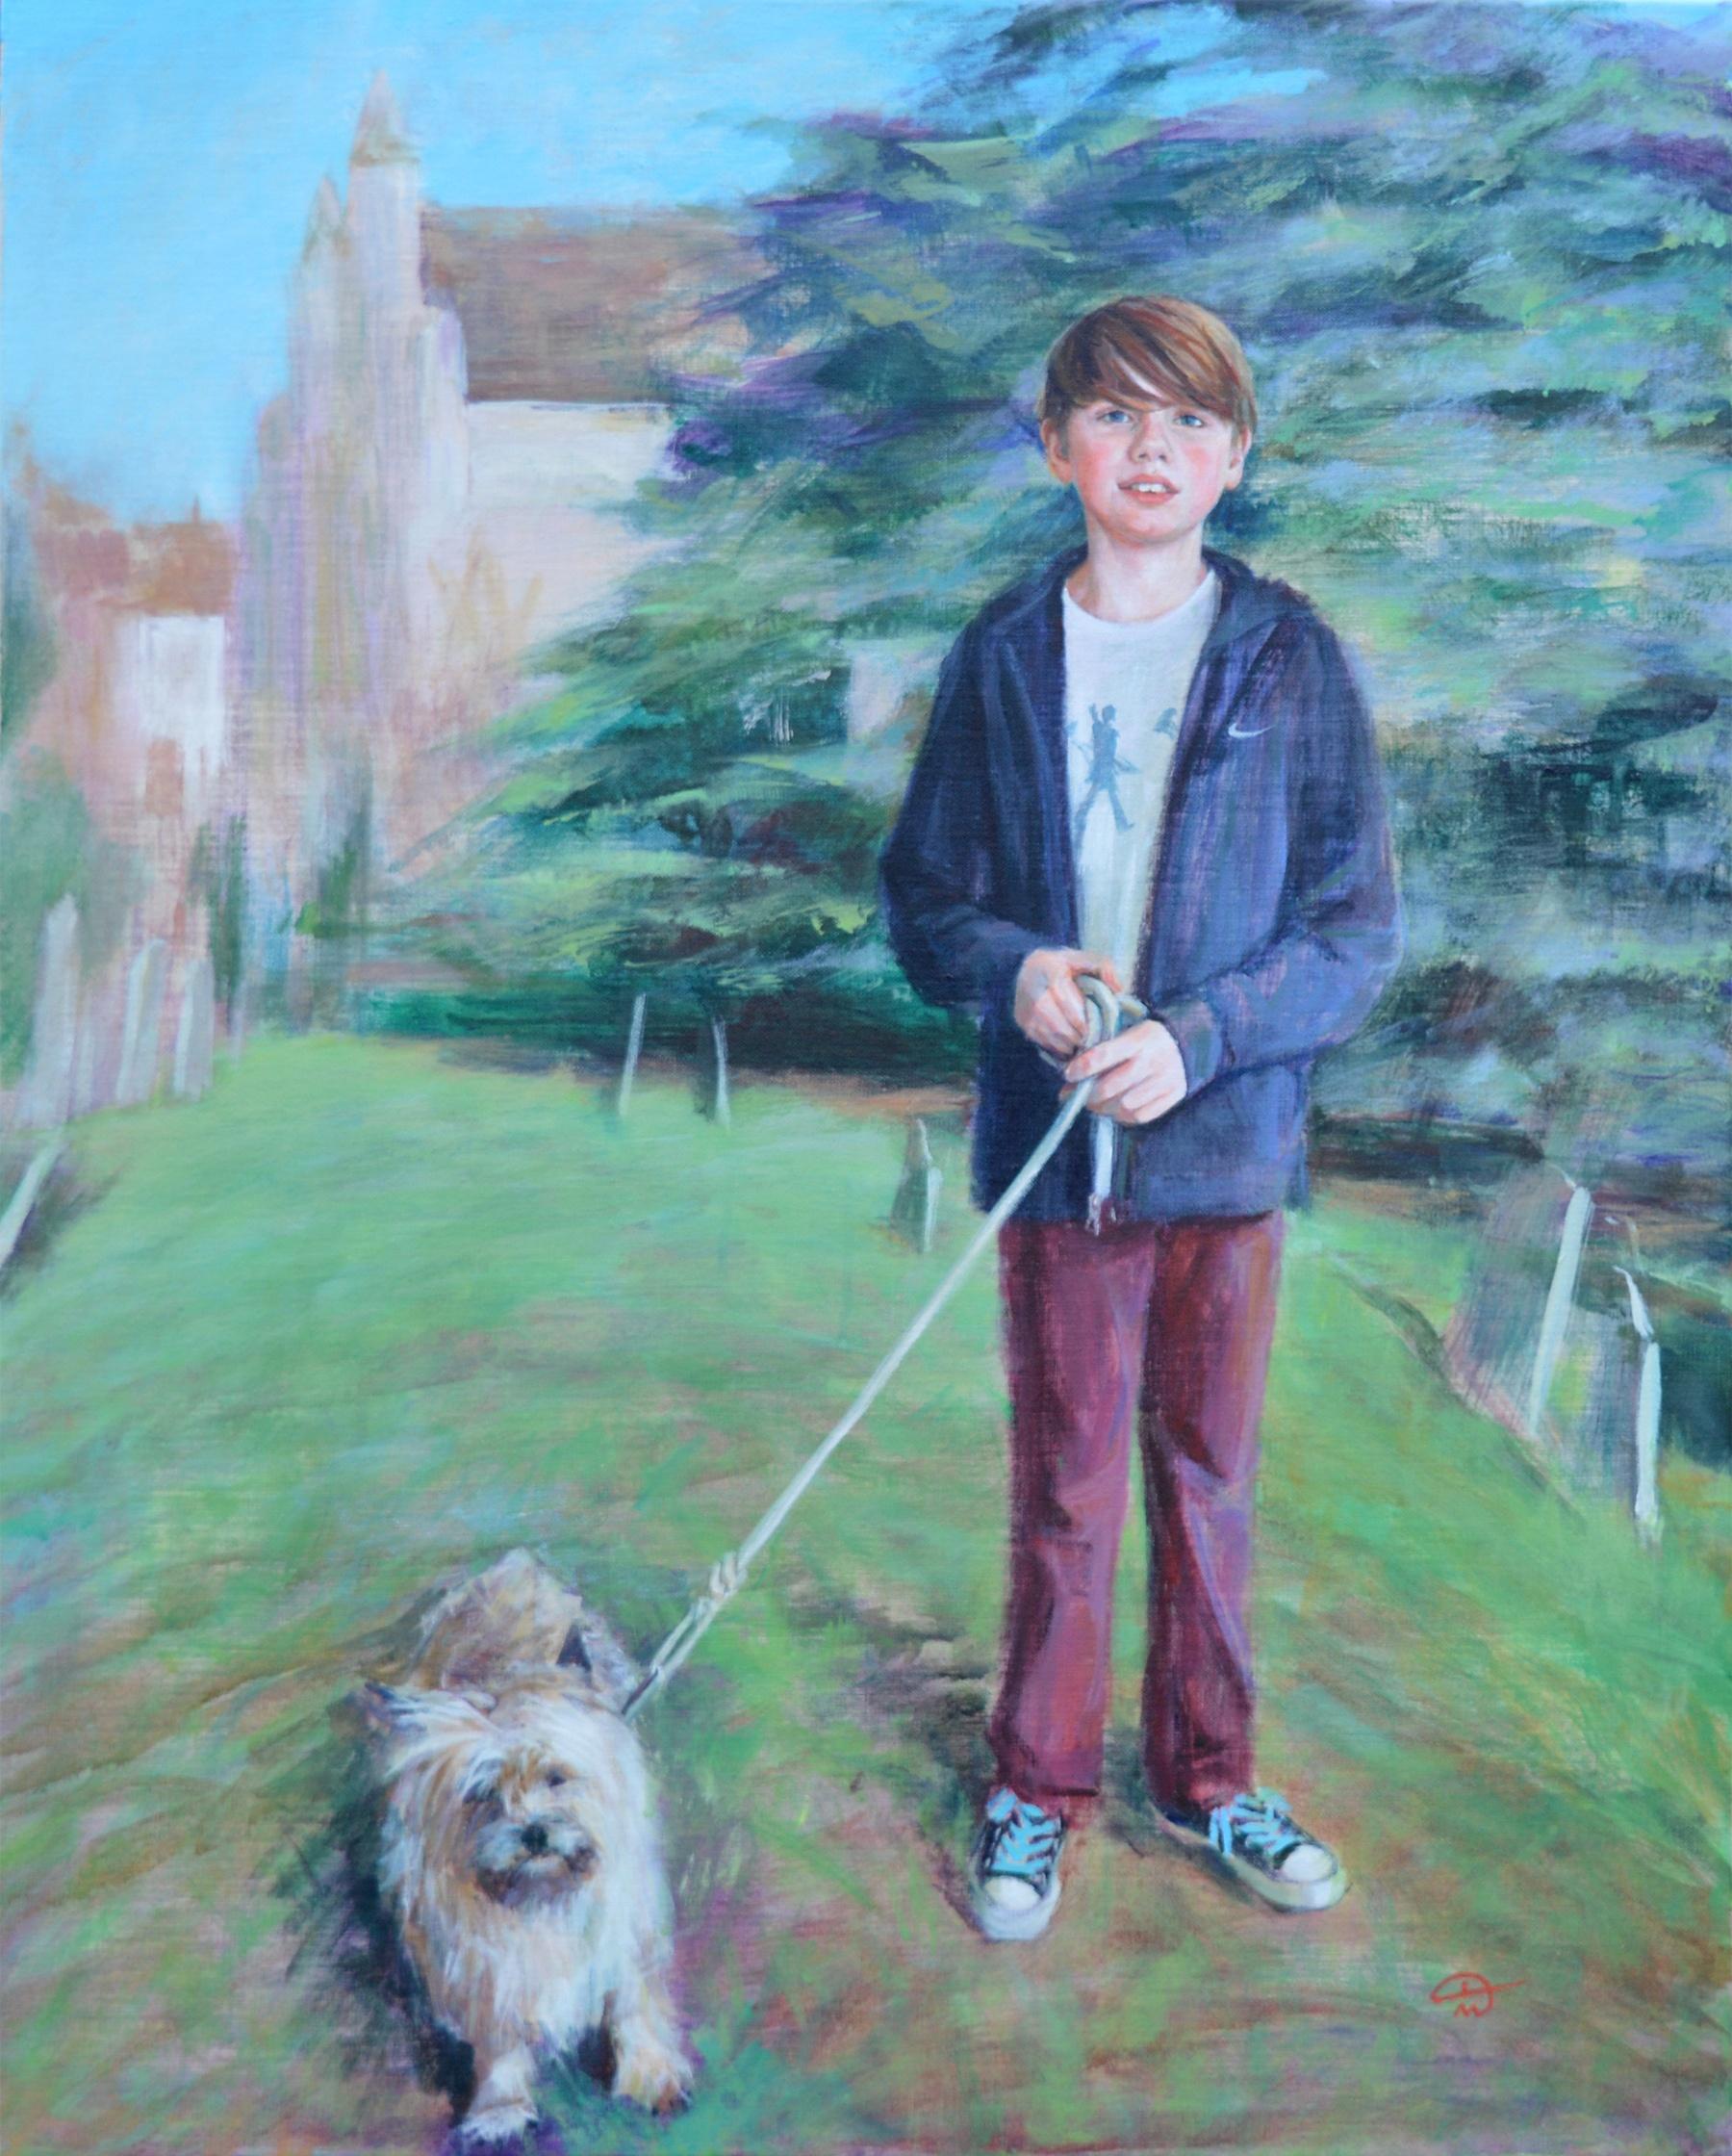 Portrait of Benji and Jack. Acrylic on canvas. Portrait commission by artist Marina Kim